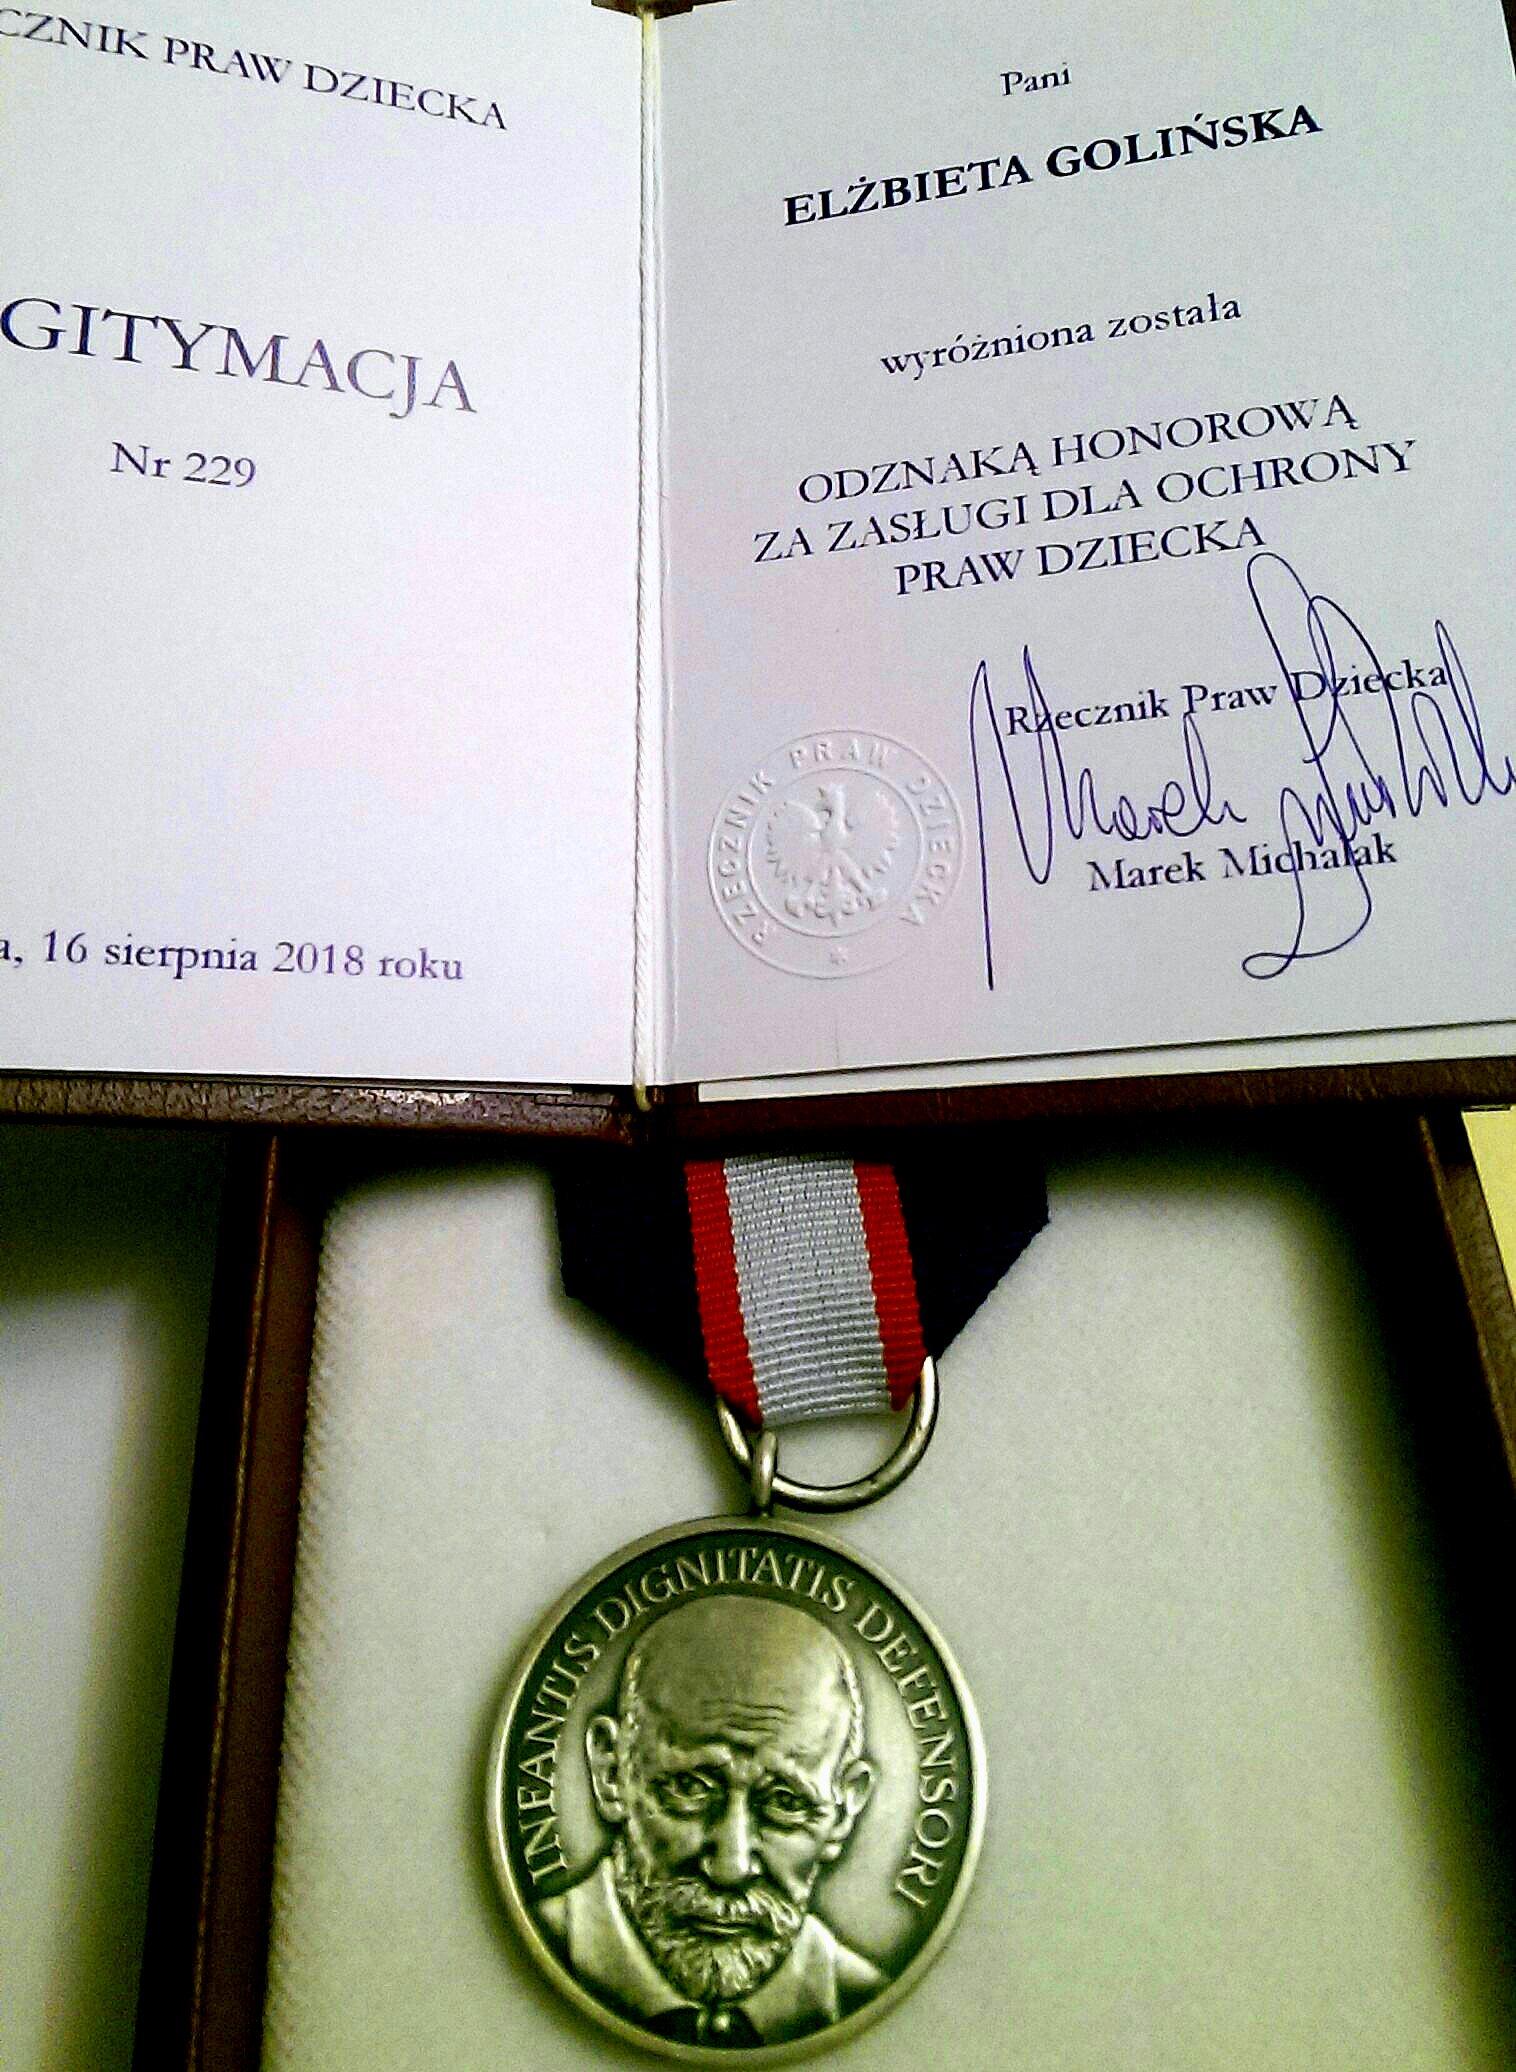 Honorowa odznaka Infantis Dignitatis Defensori